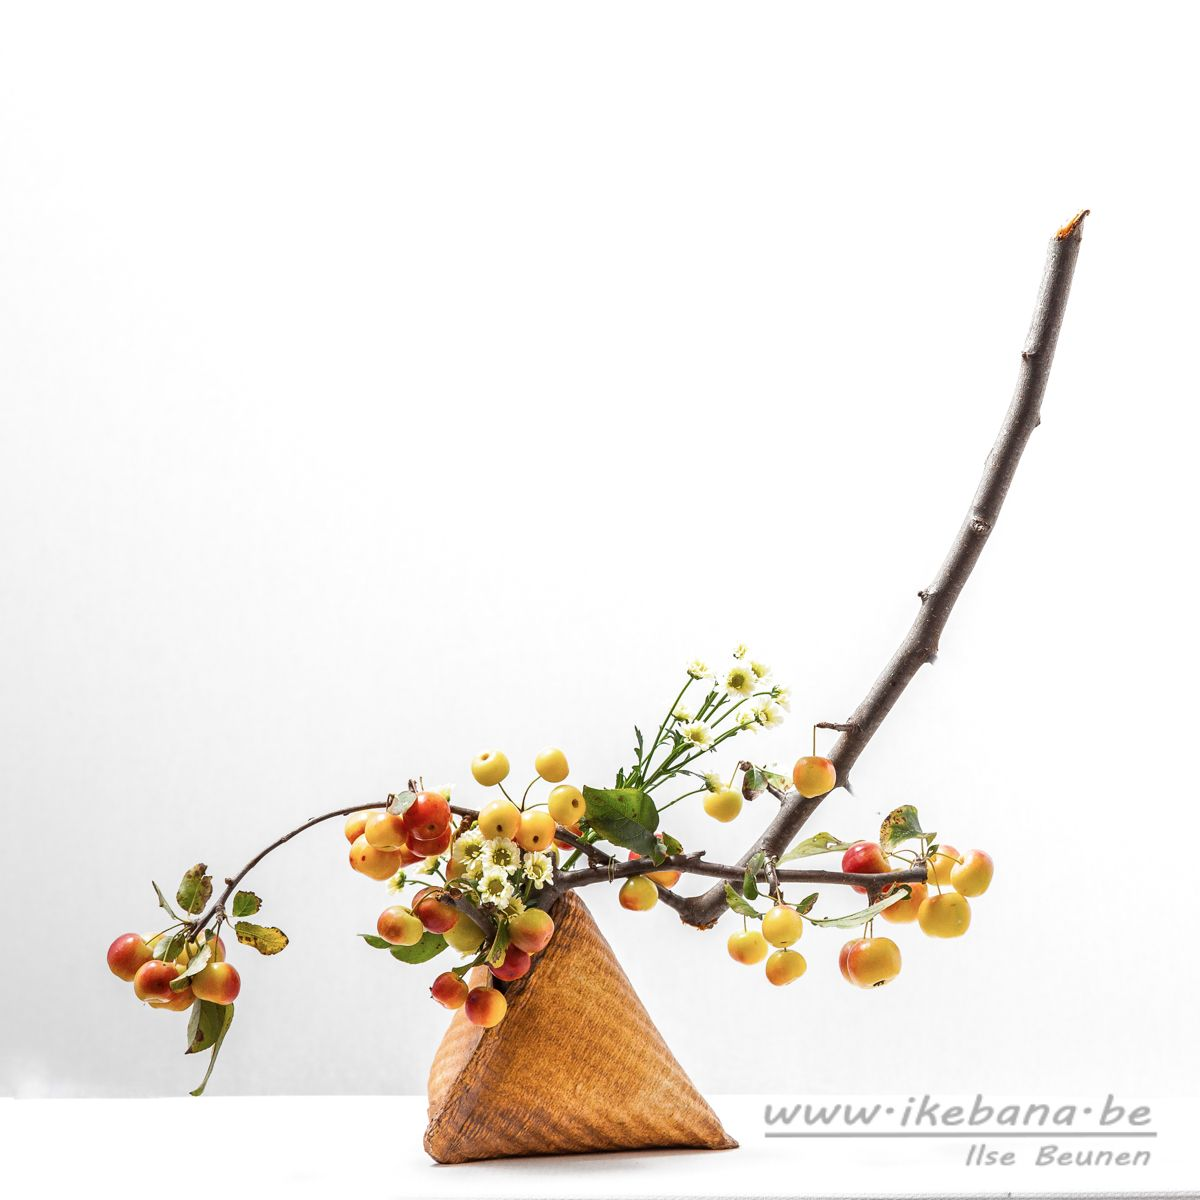 Sogetsu ikebana arrangement with fruit bearing branches